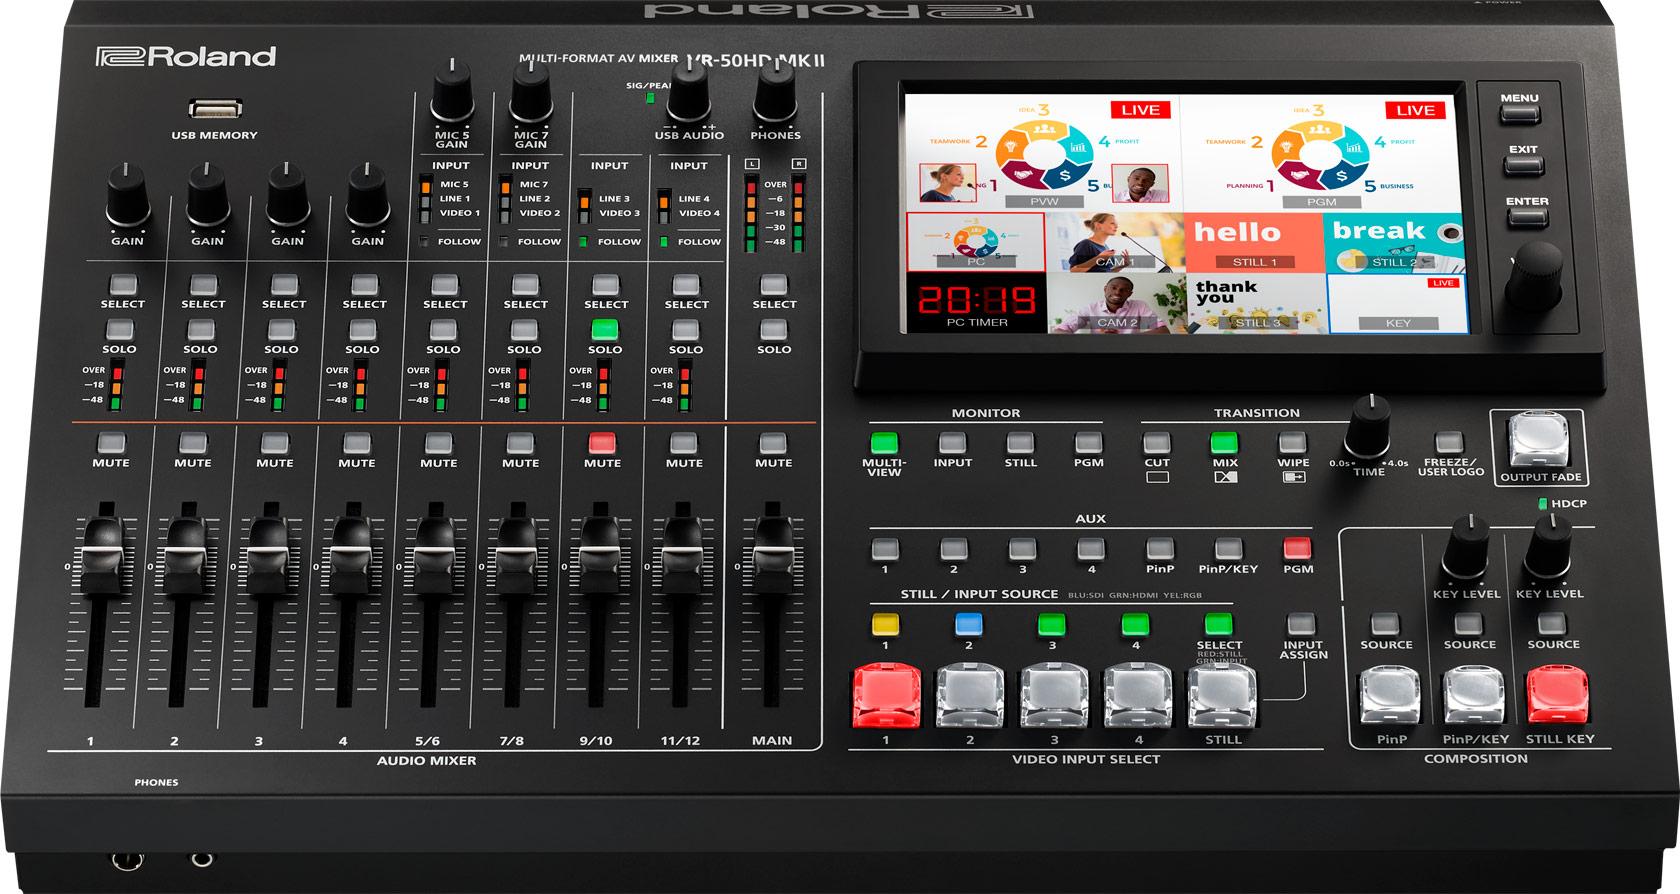 Afbeelding van Roland VR-50 HD MK2 videomixer FULL HD met audio en streaming